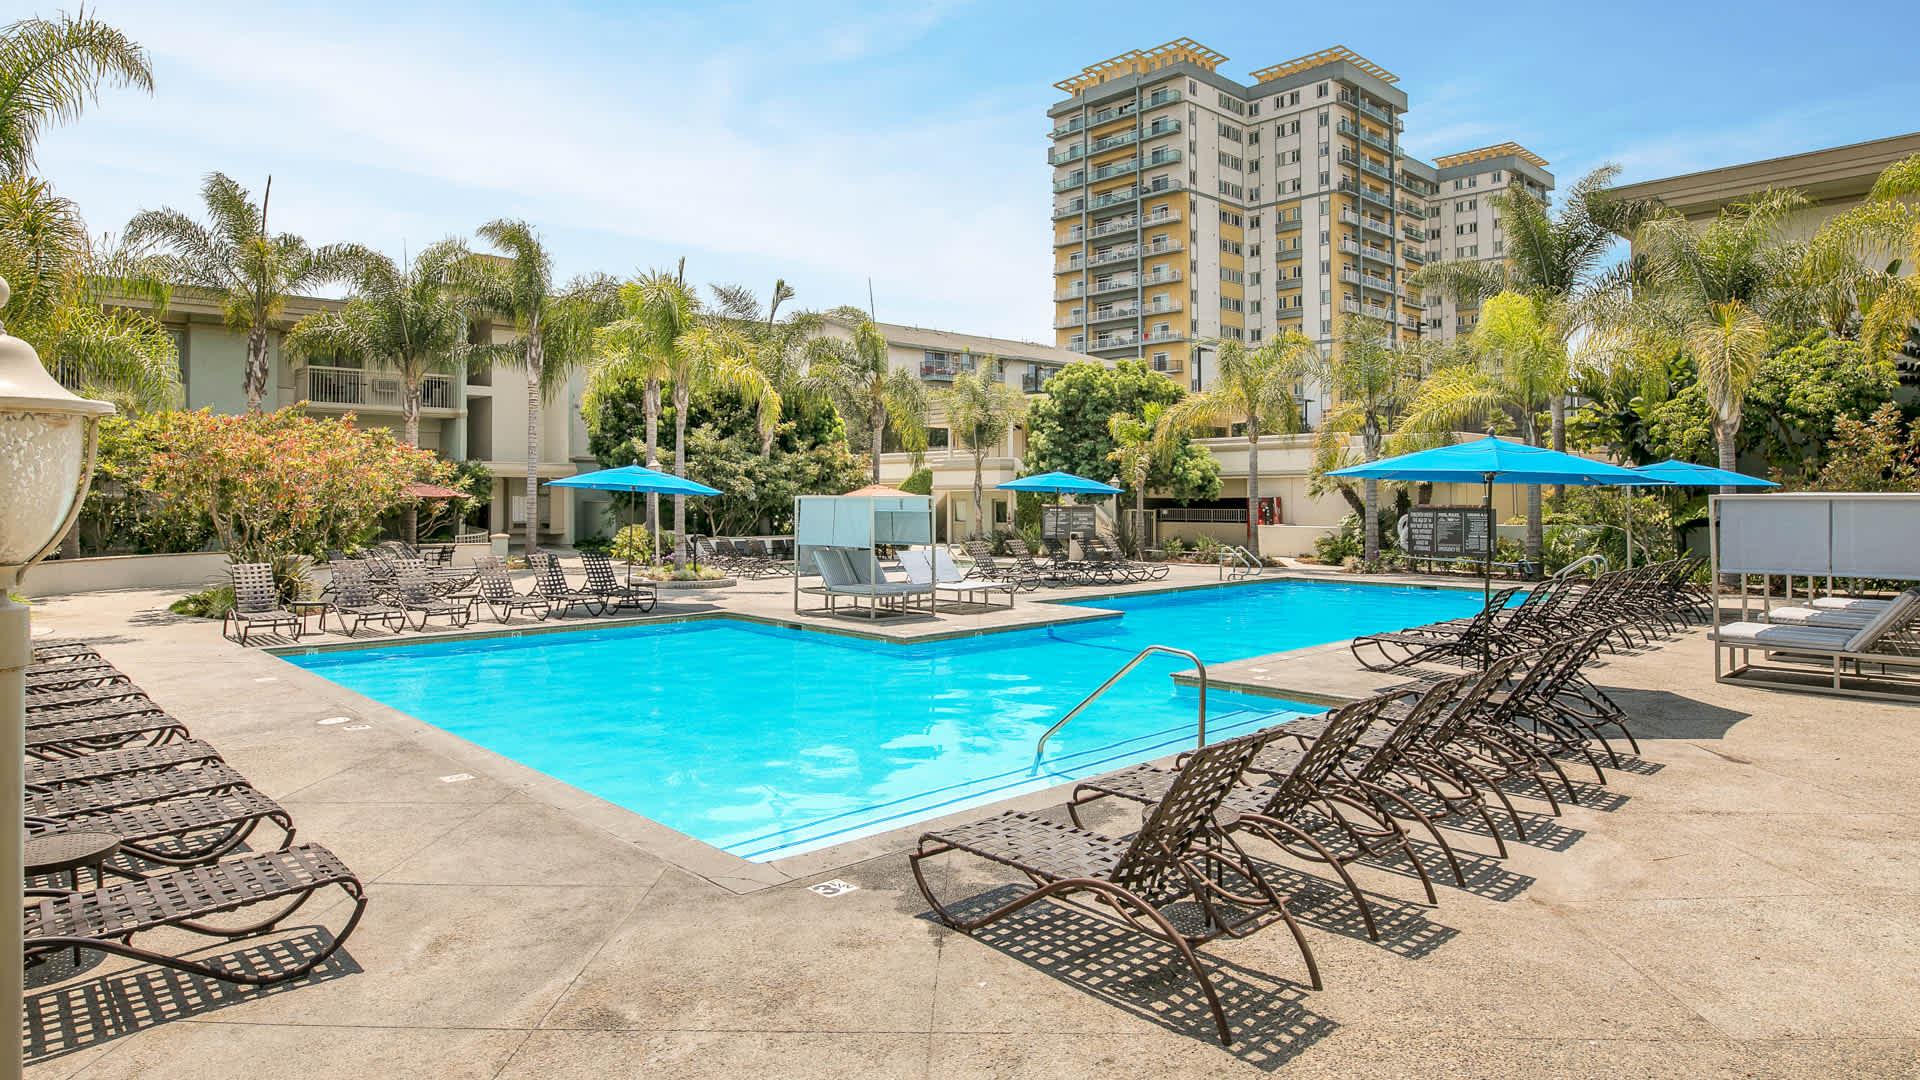 Pearl Apartments - 4111 South Via Marina | EquityApartments.com